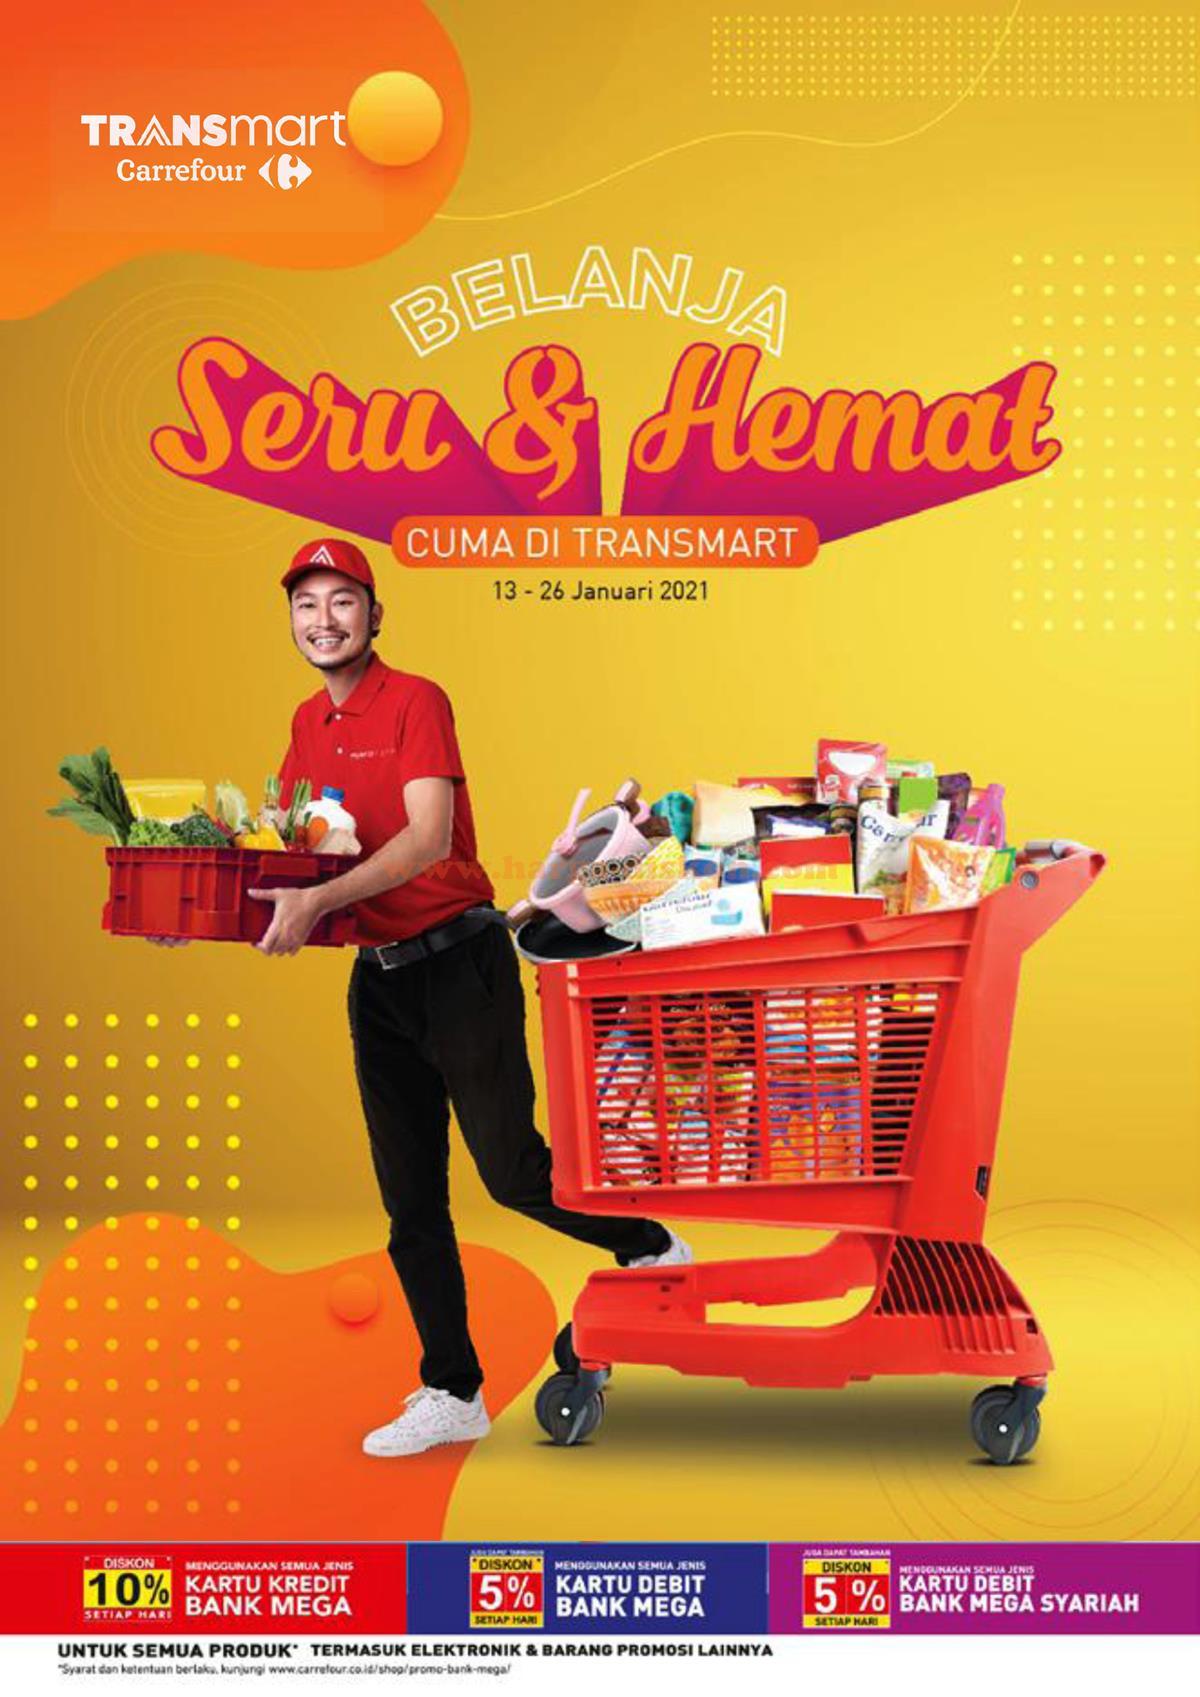 Katalog Promo Transmart Carrefour Terbaru 13 26 Januari 2021 Harga Diskon